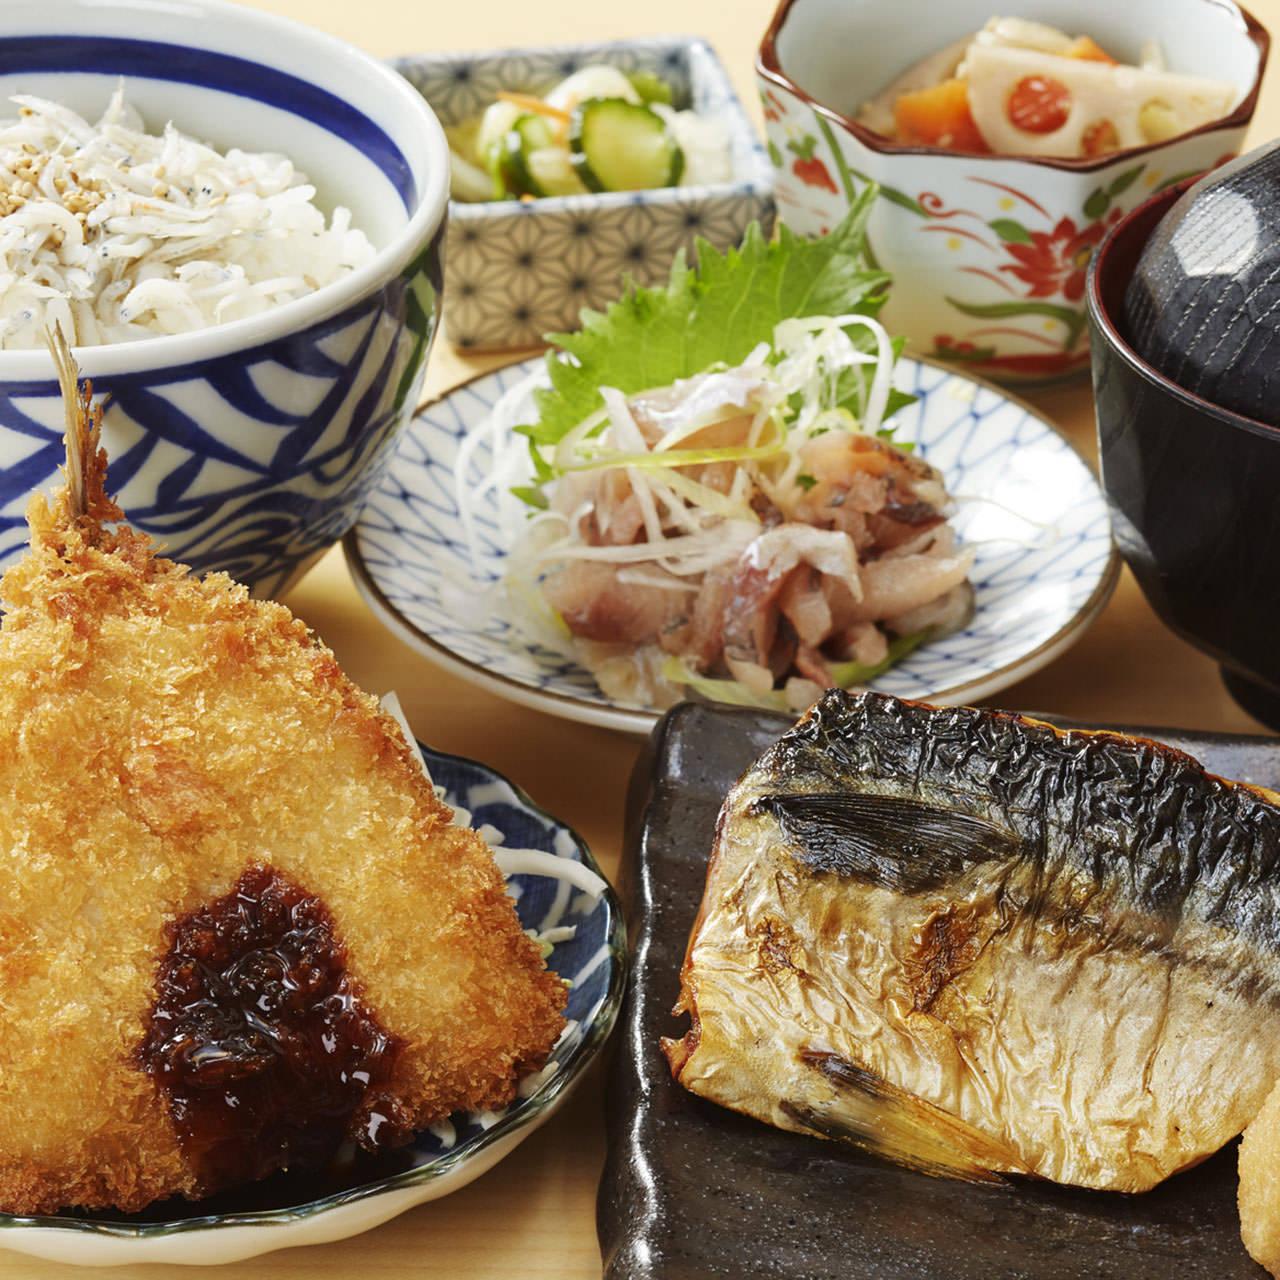 個室海鮮居酒屋 魚盛 新宿三丁目店のイメージ写真